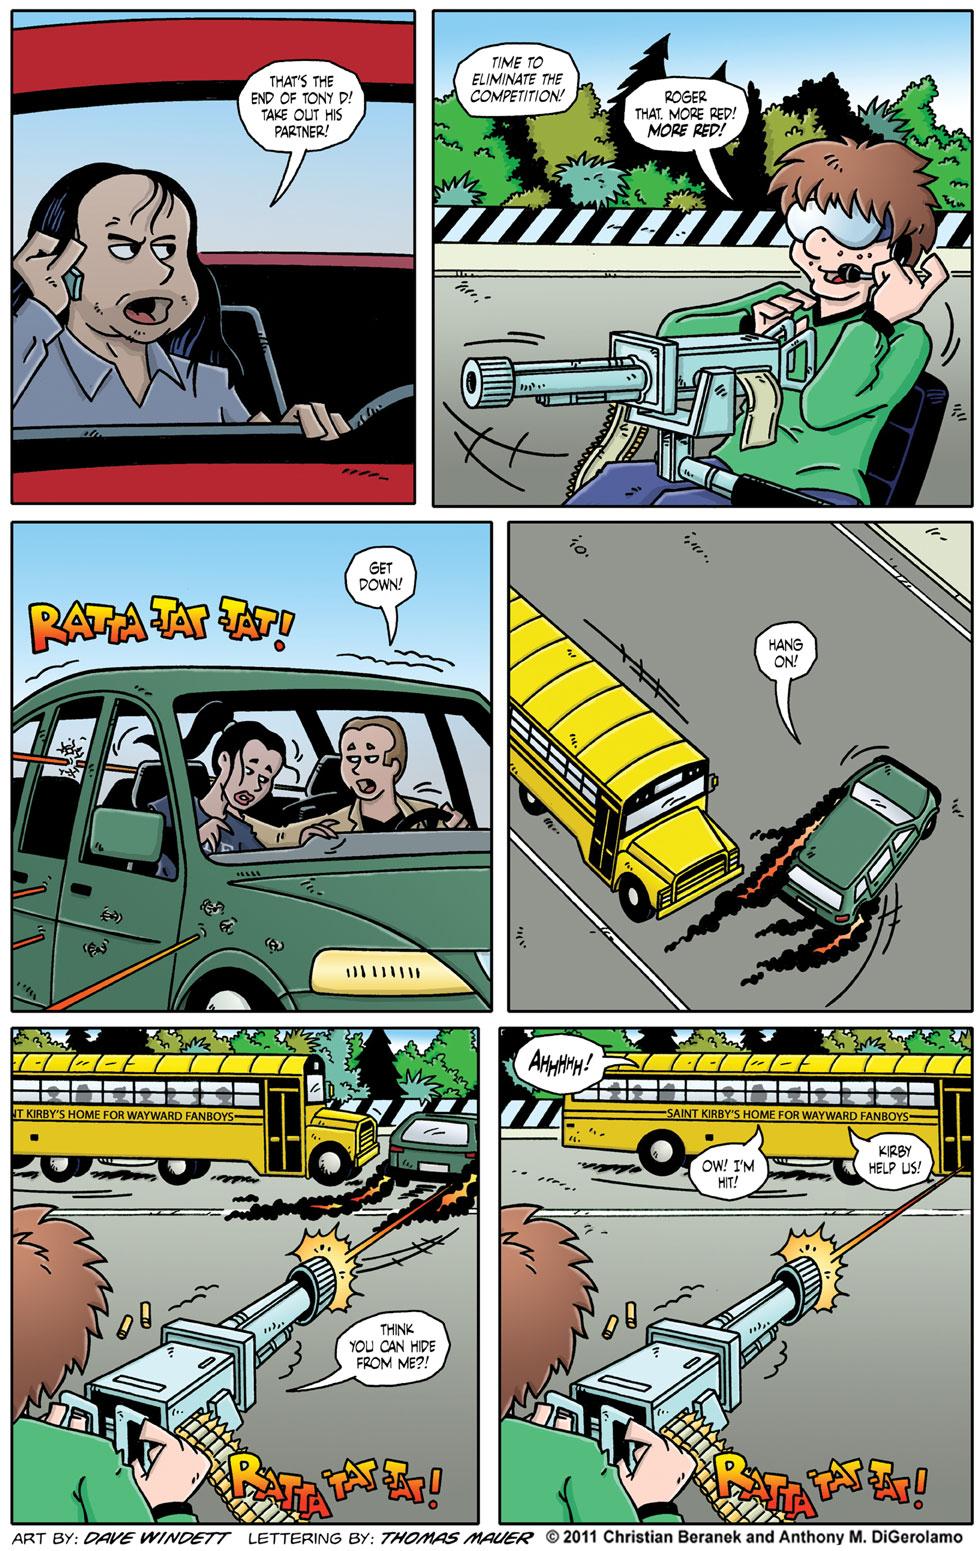 Comic Book Mafia: Saint Kirby's Home for Wayward Fanboys